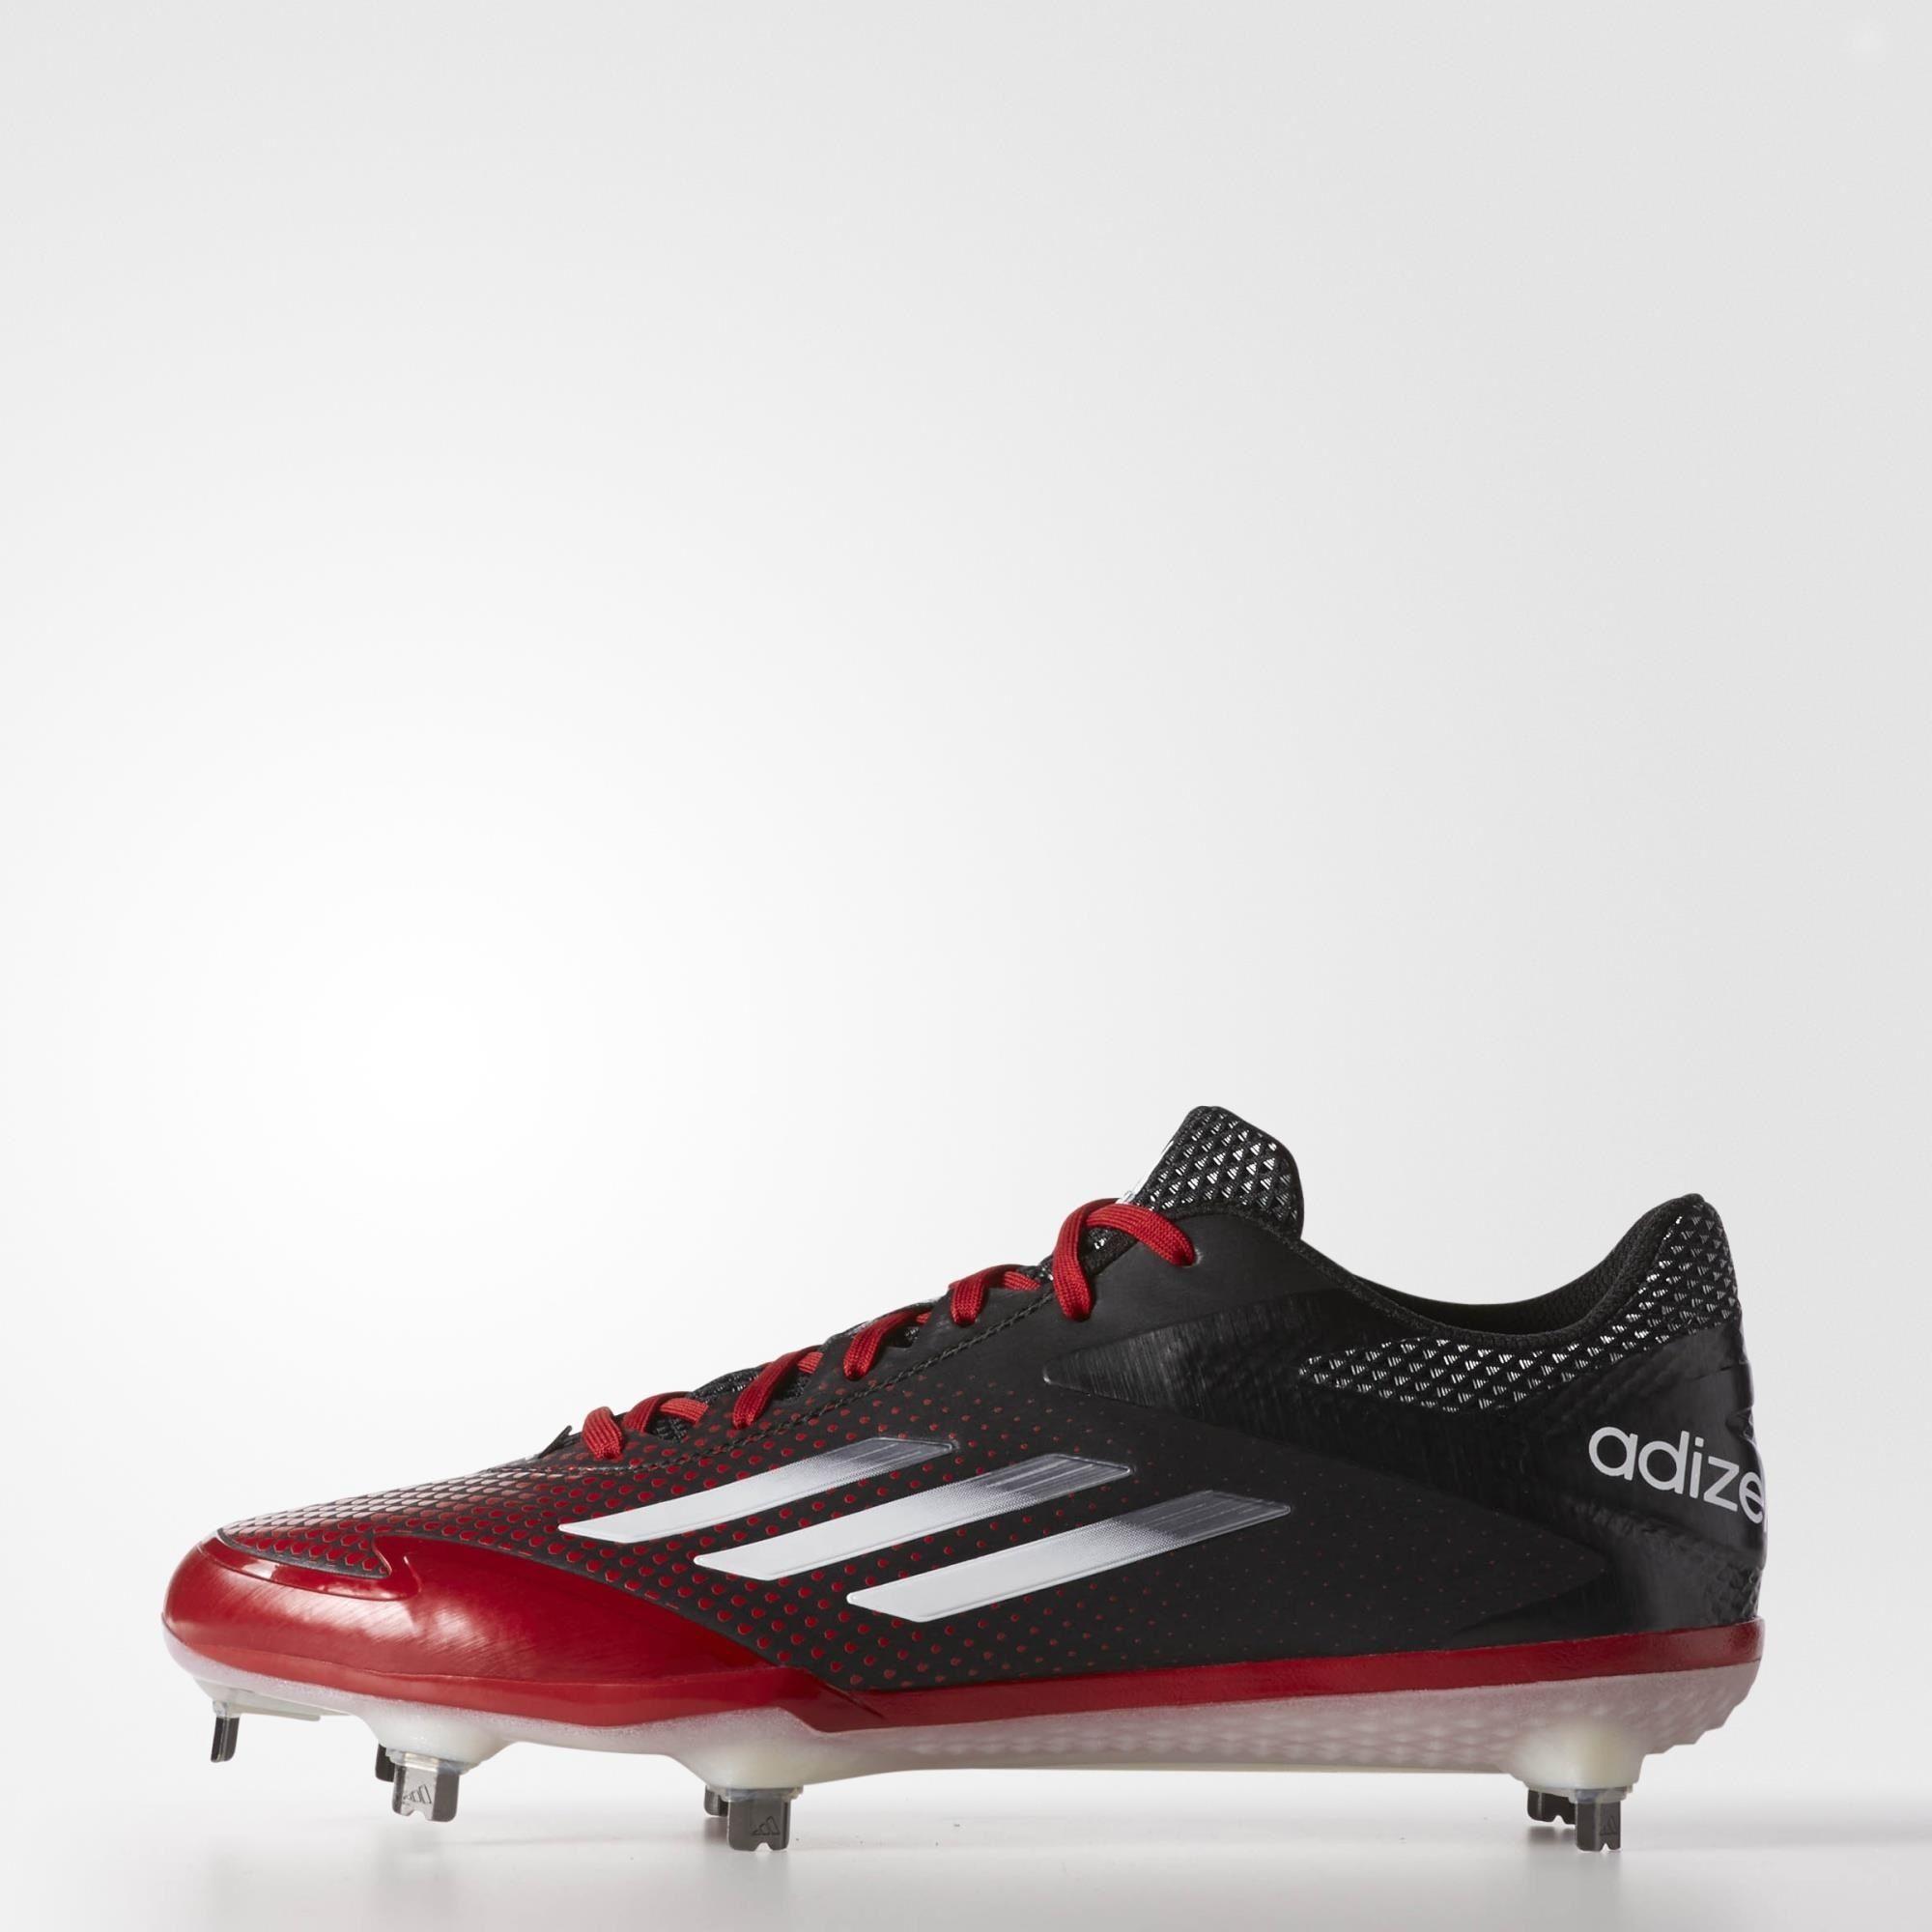 adidas adizero postbruciatore scarpe adidas noi botines nero